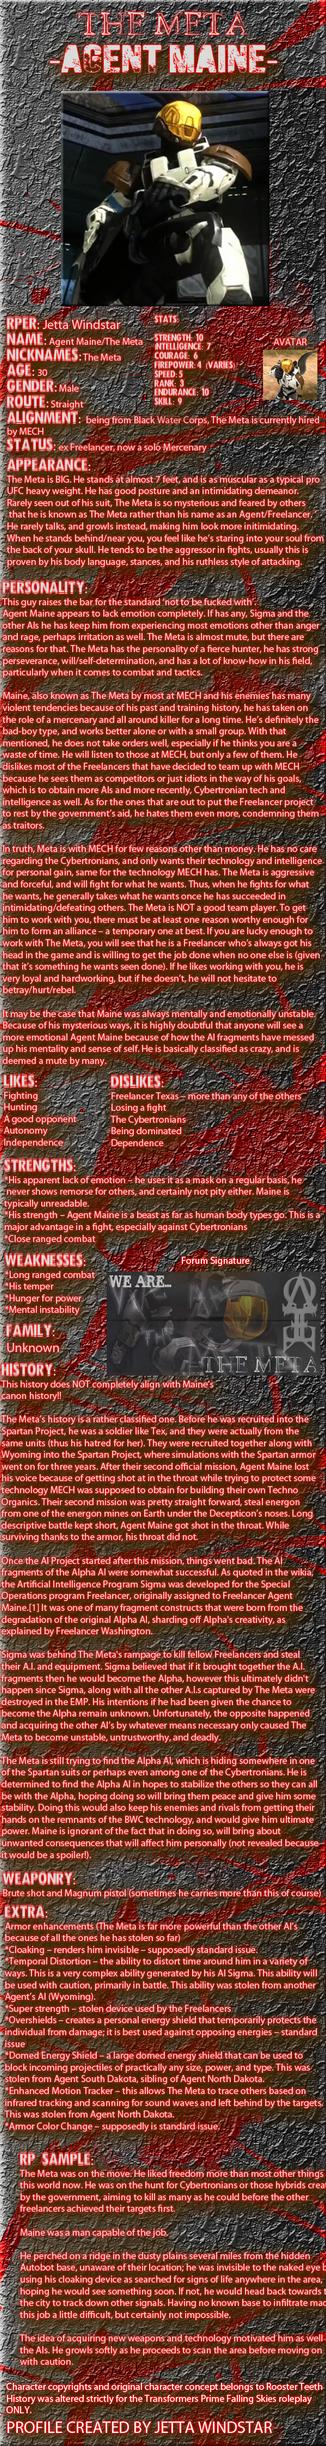 Agent Maine Image Bio by Jetta-Windstar